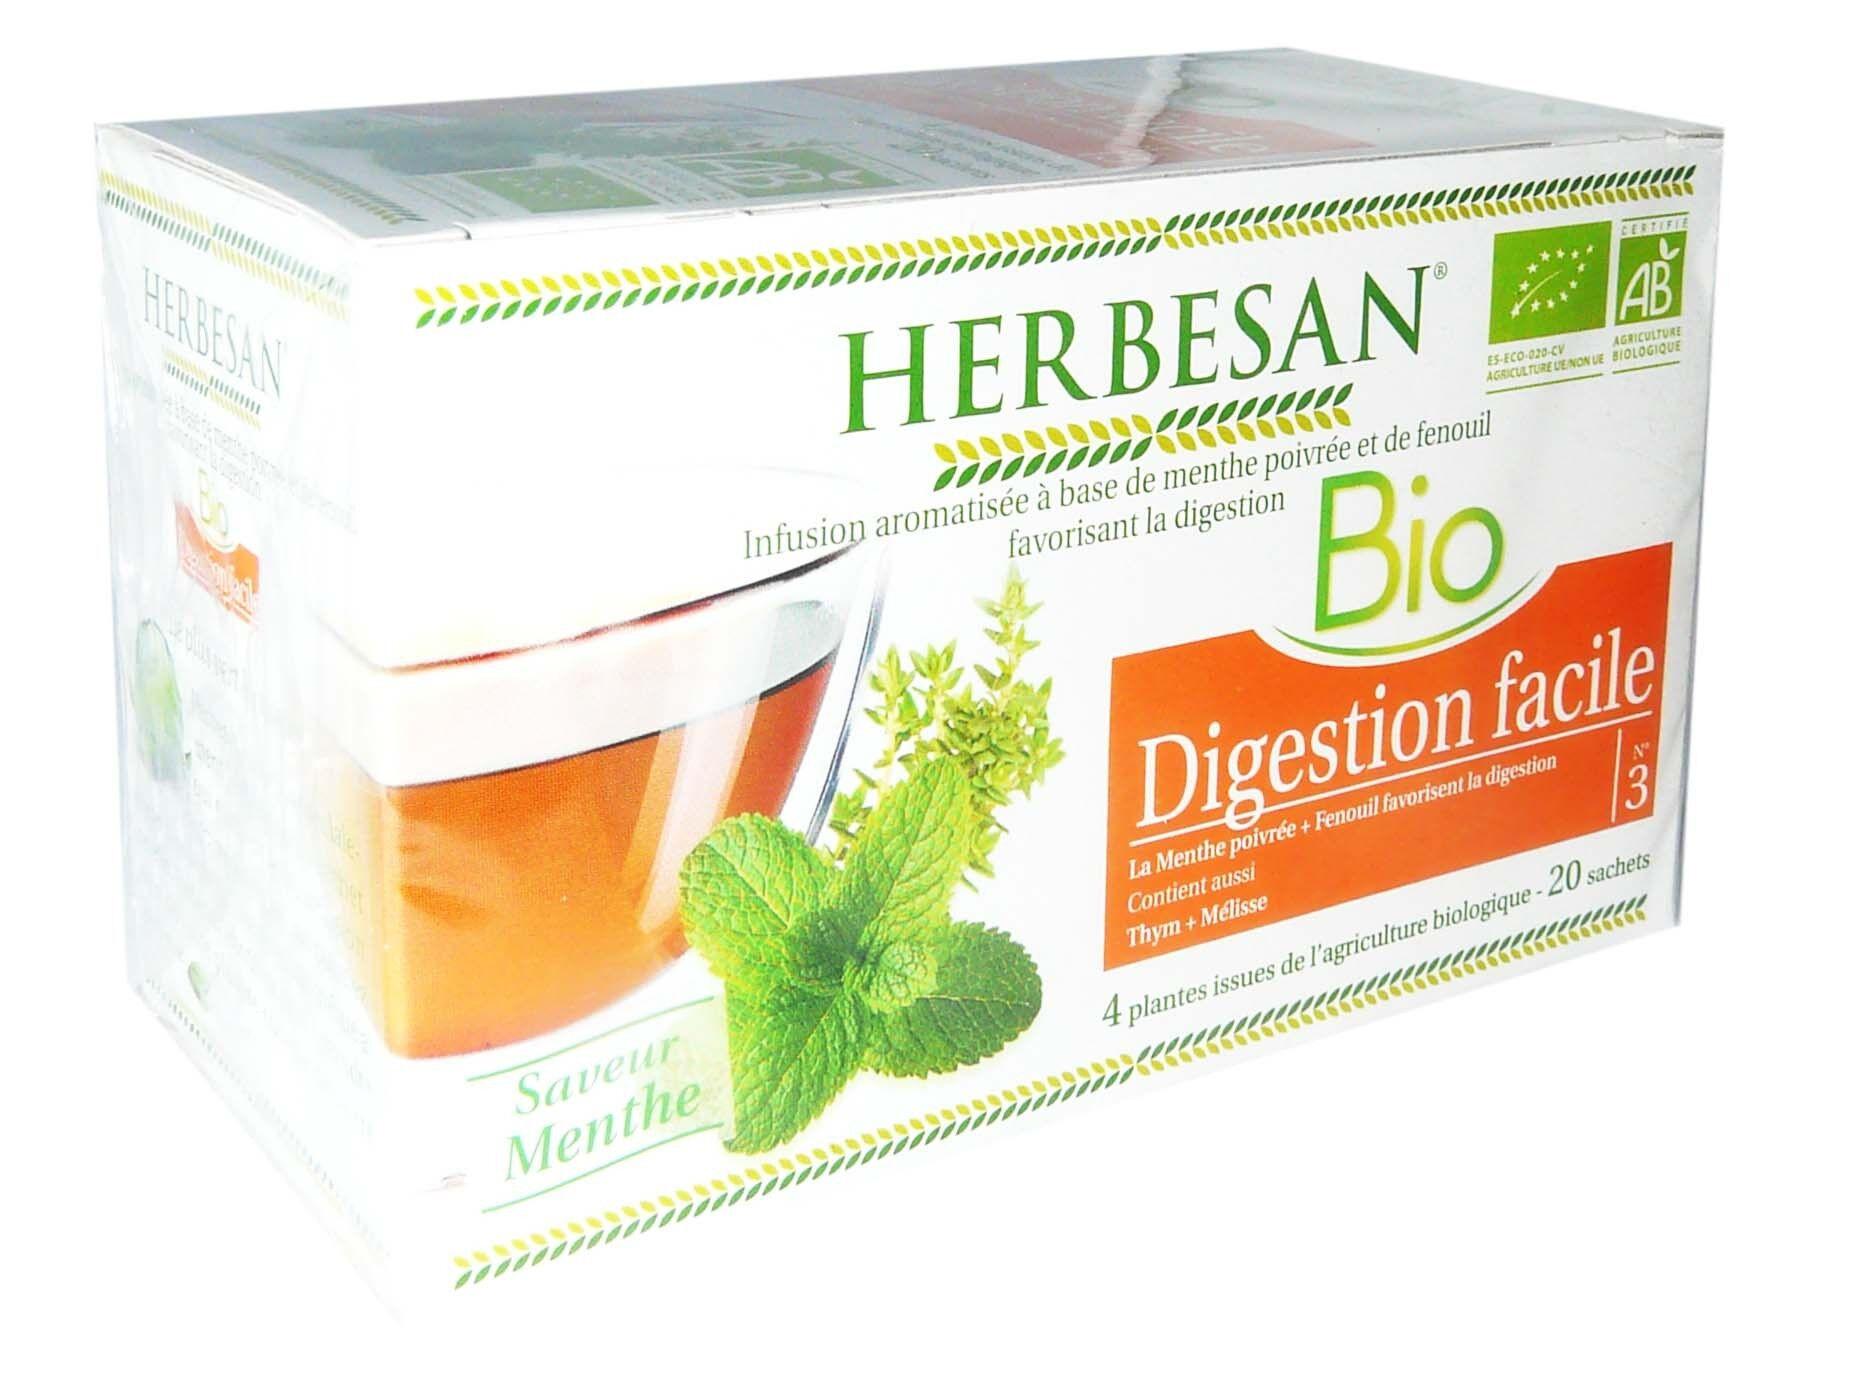 Herbesan bio digestion facile saveur menthe 20 sachets